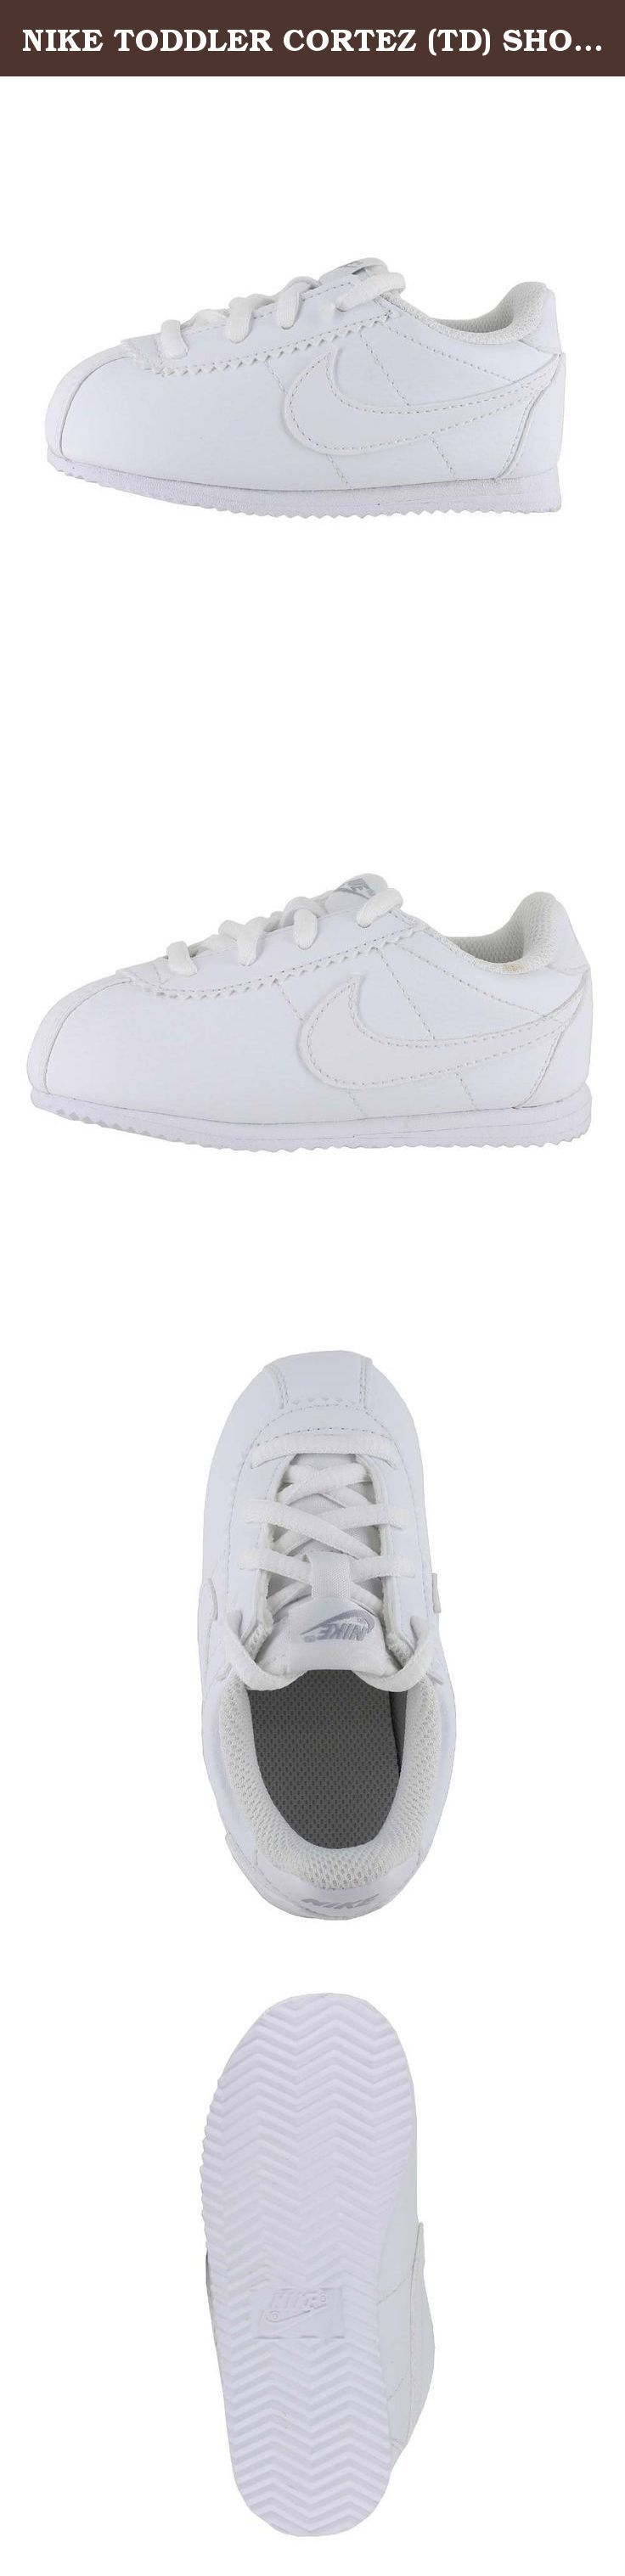 NIKE TODDLER CORTEZ (TD) SHOES WHITE WOLF GREY WHITE SIZE 10. Indulge in track-running nostalgia with the Nike Cortez shoe.